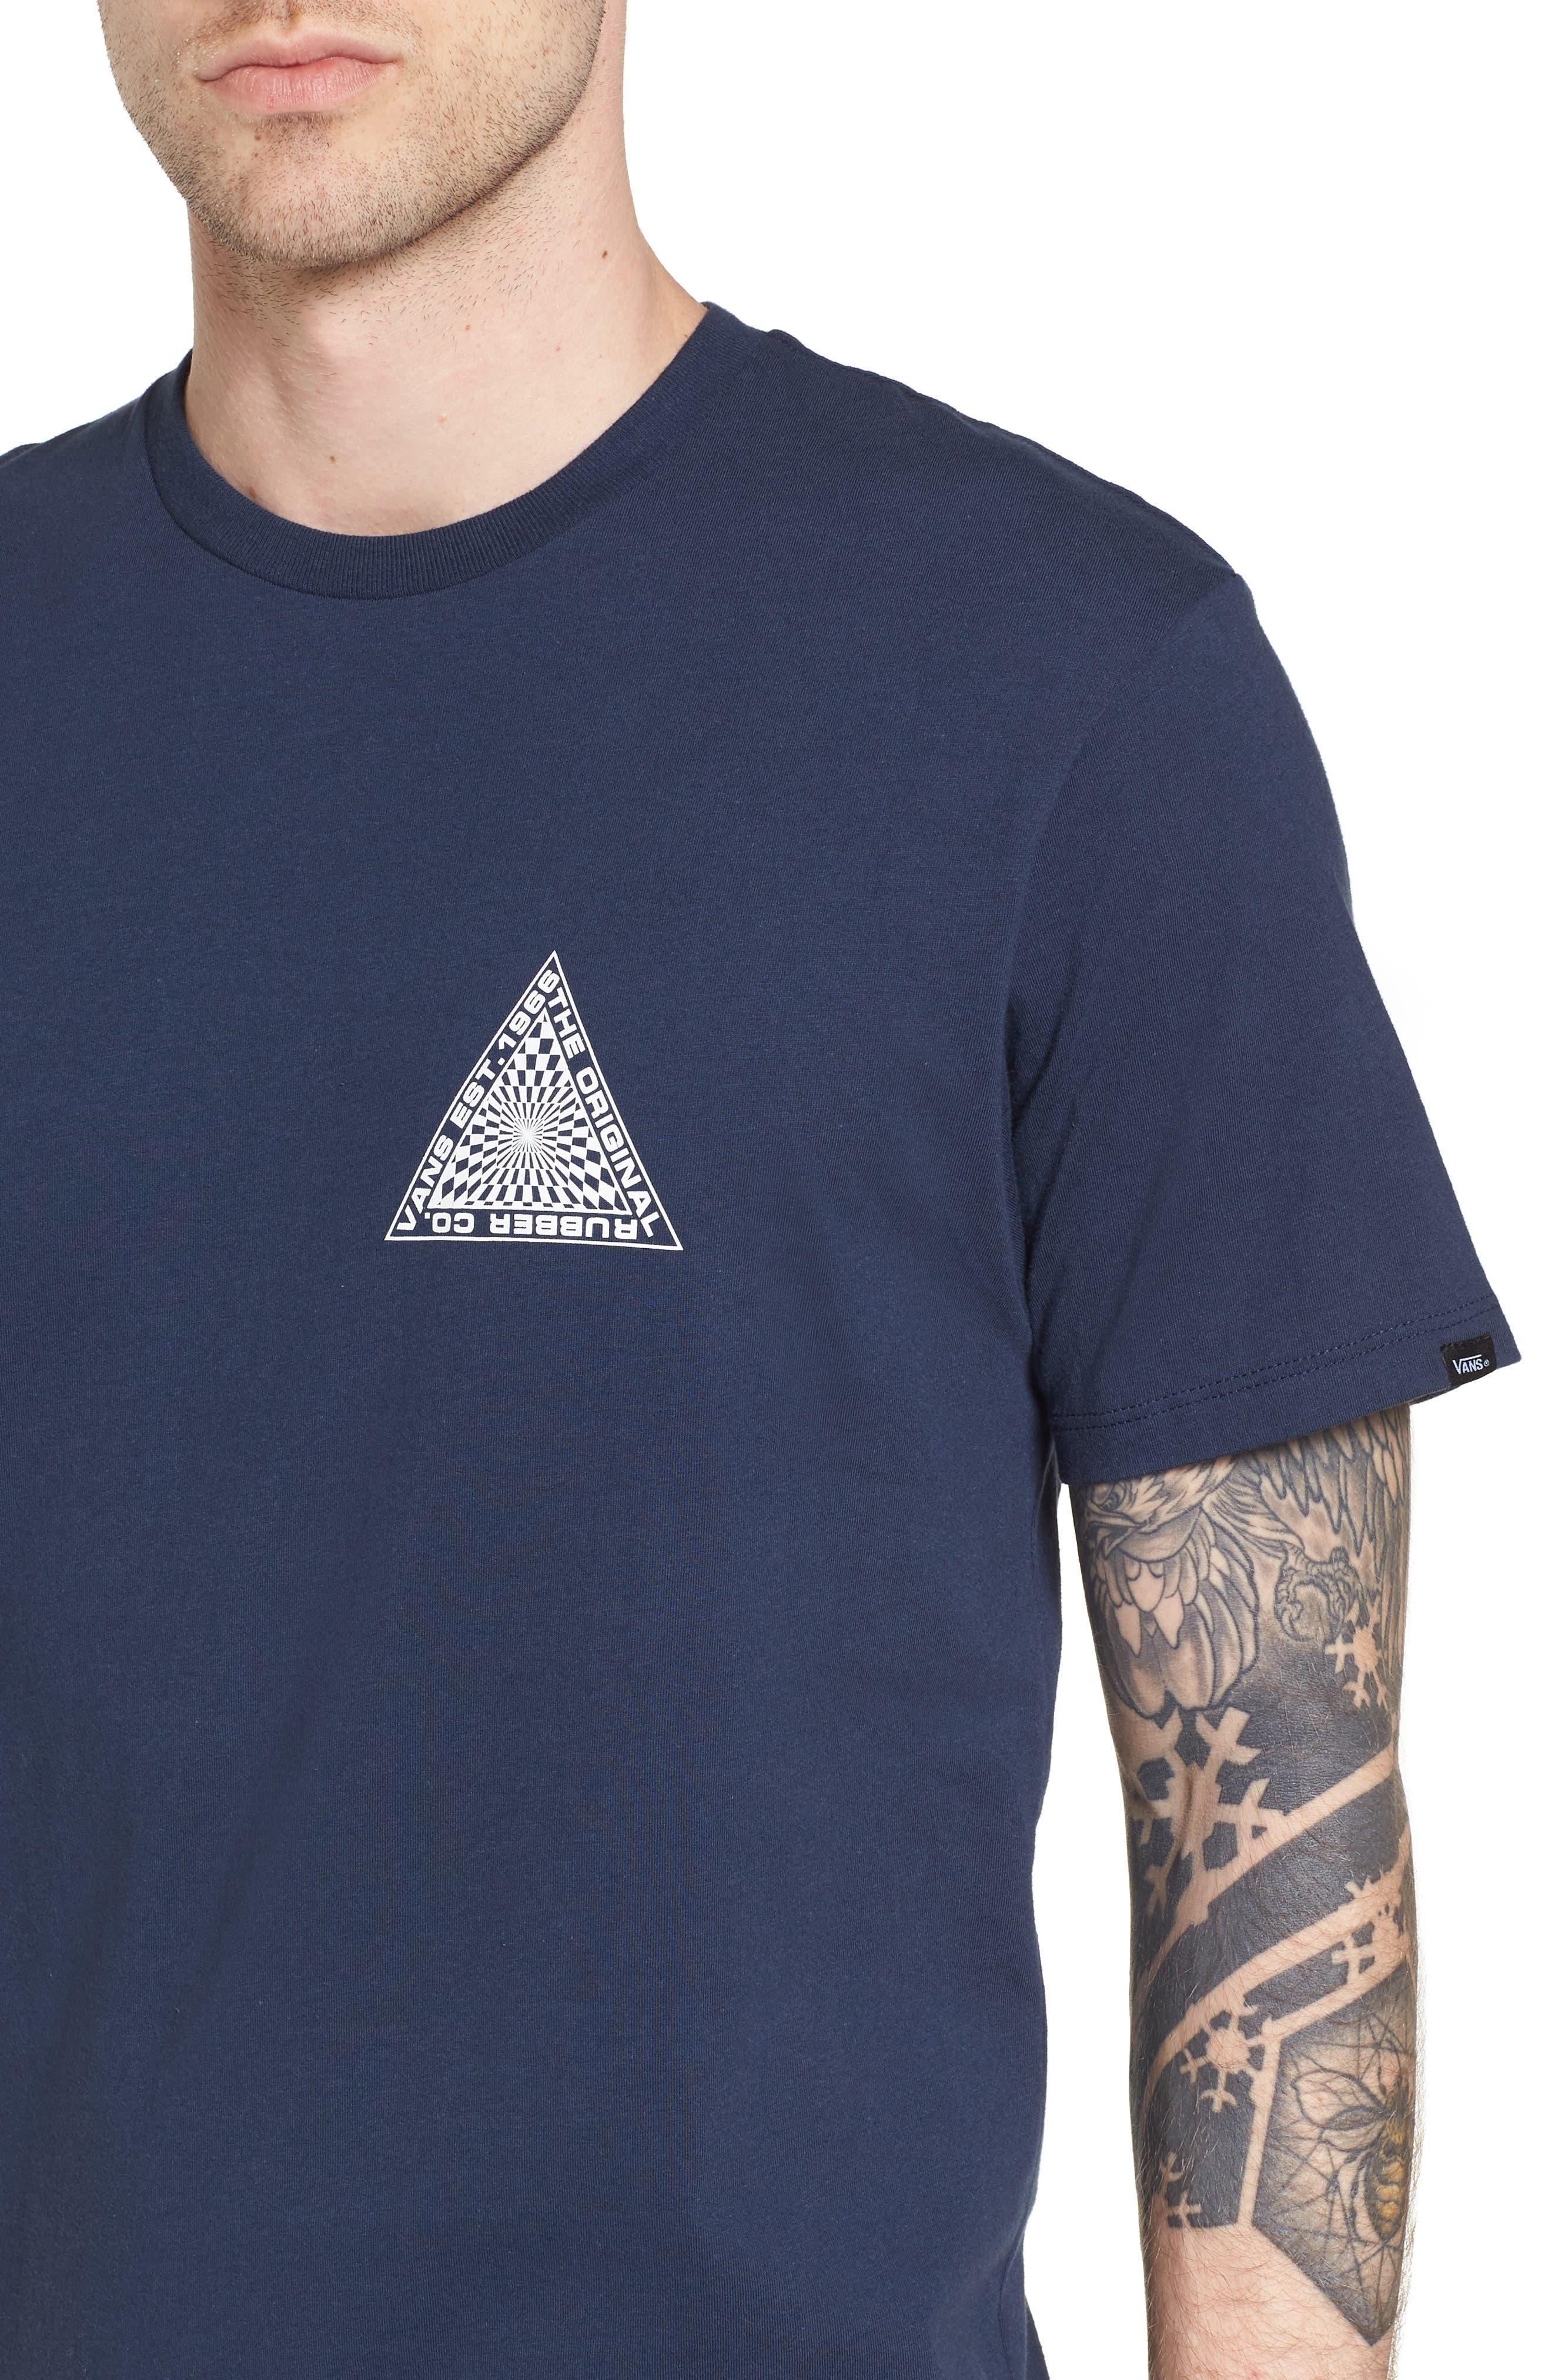 Hypnotics T-Shirt,                             Alternate thumbnail 4, color,                             Dress Blues